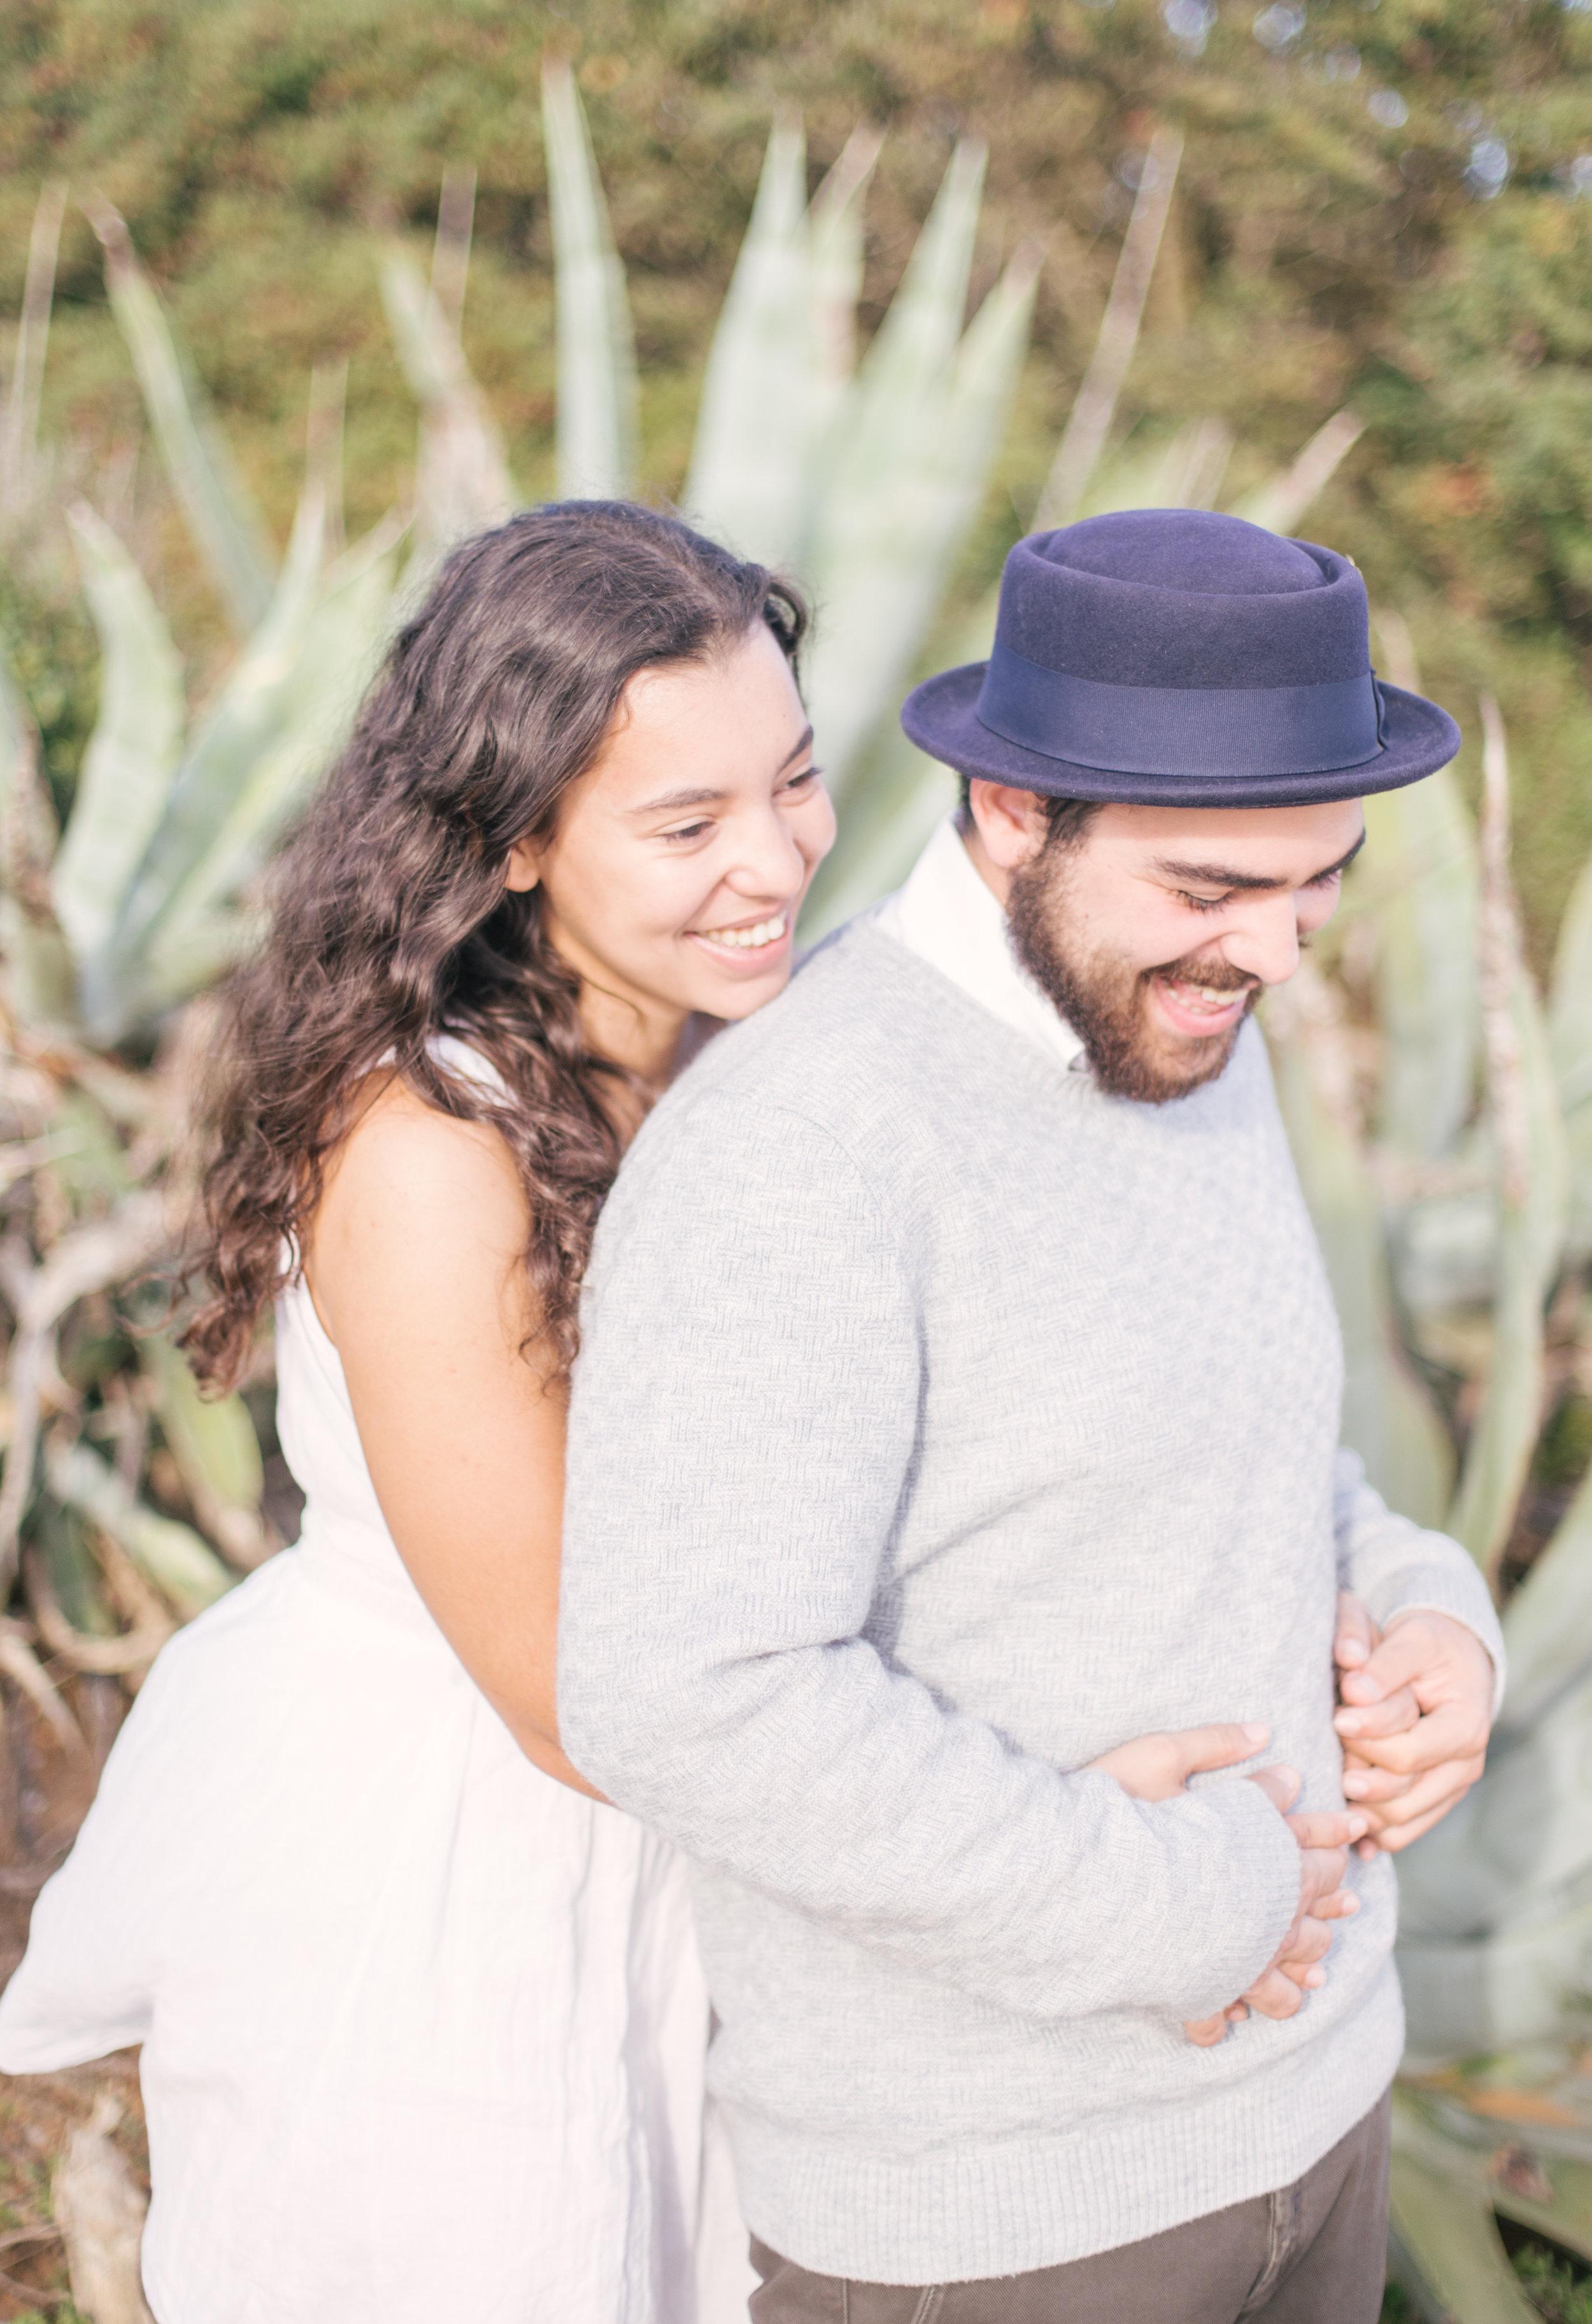 Sandra&Bernardo_v2_Nov13-52.jpg